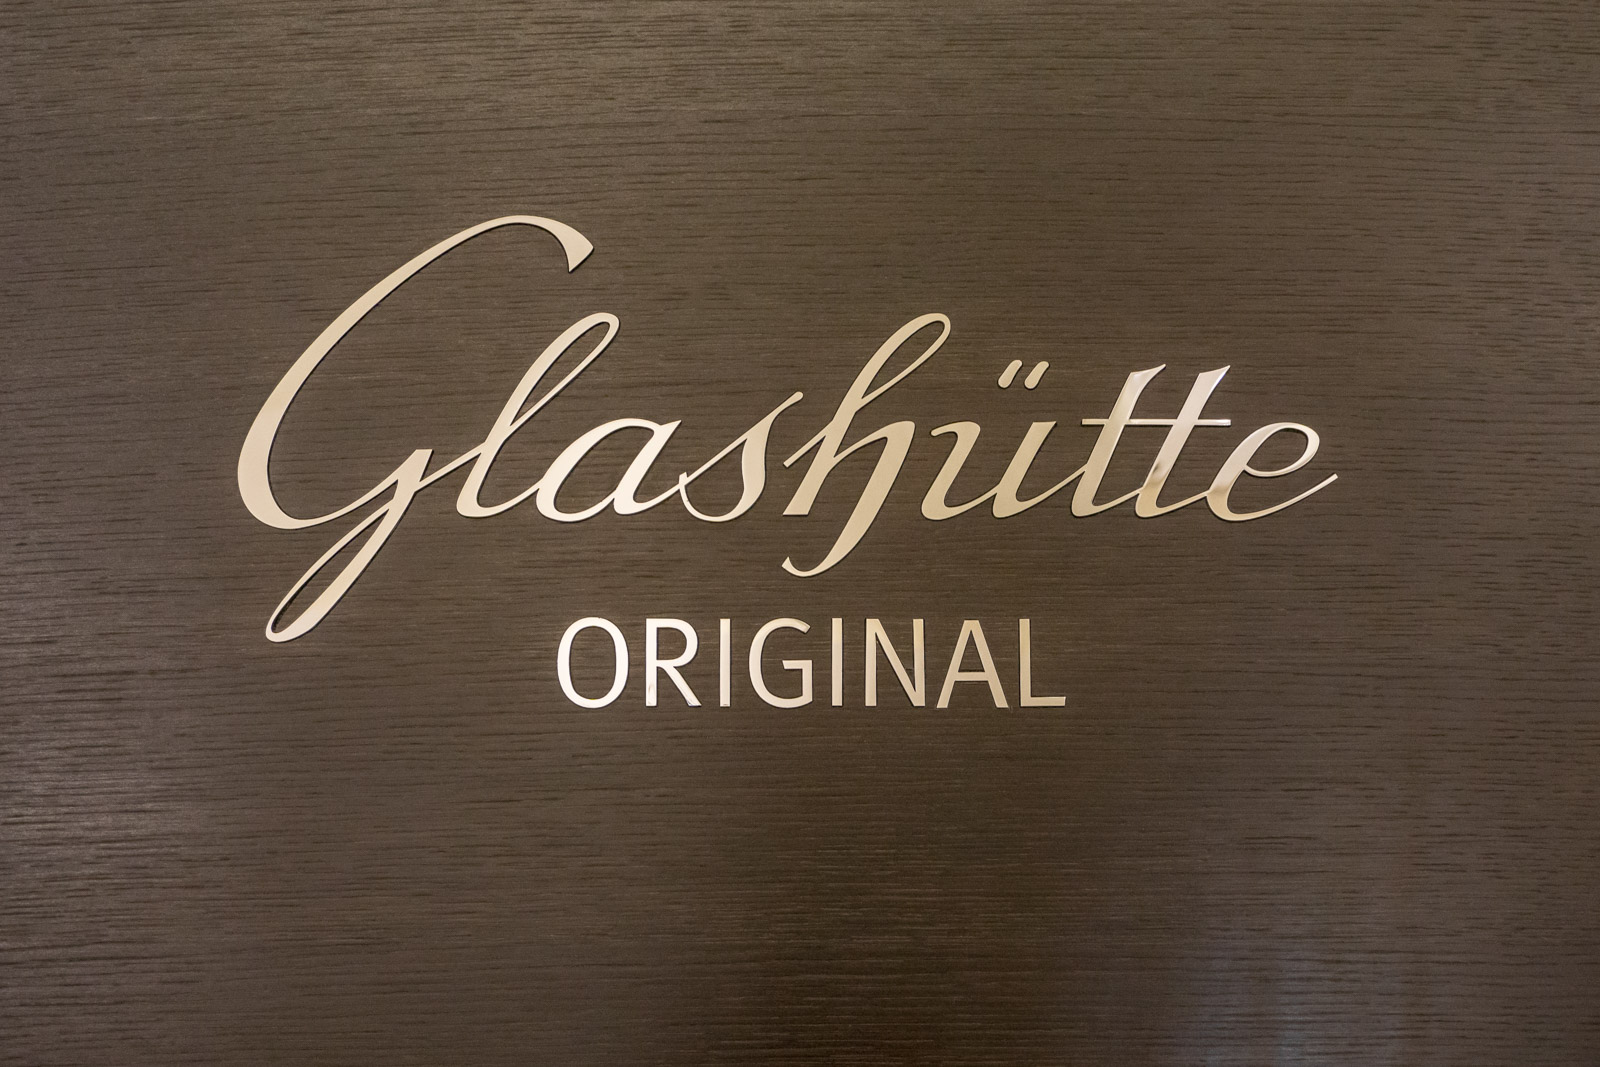 glashutte-original-senator-observer-berlin-8310